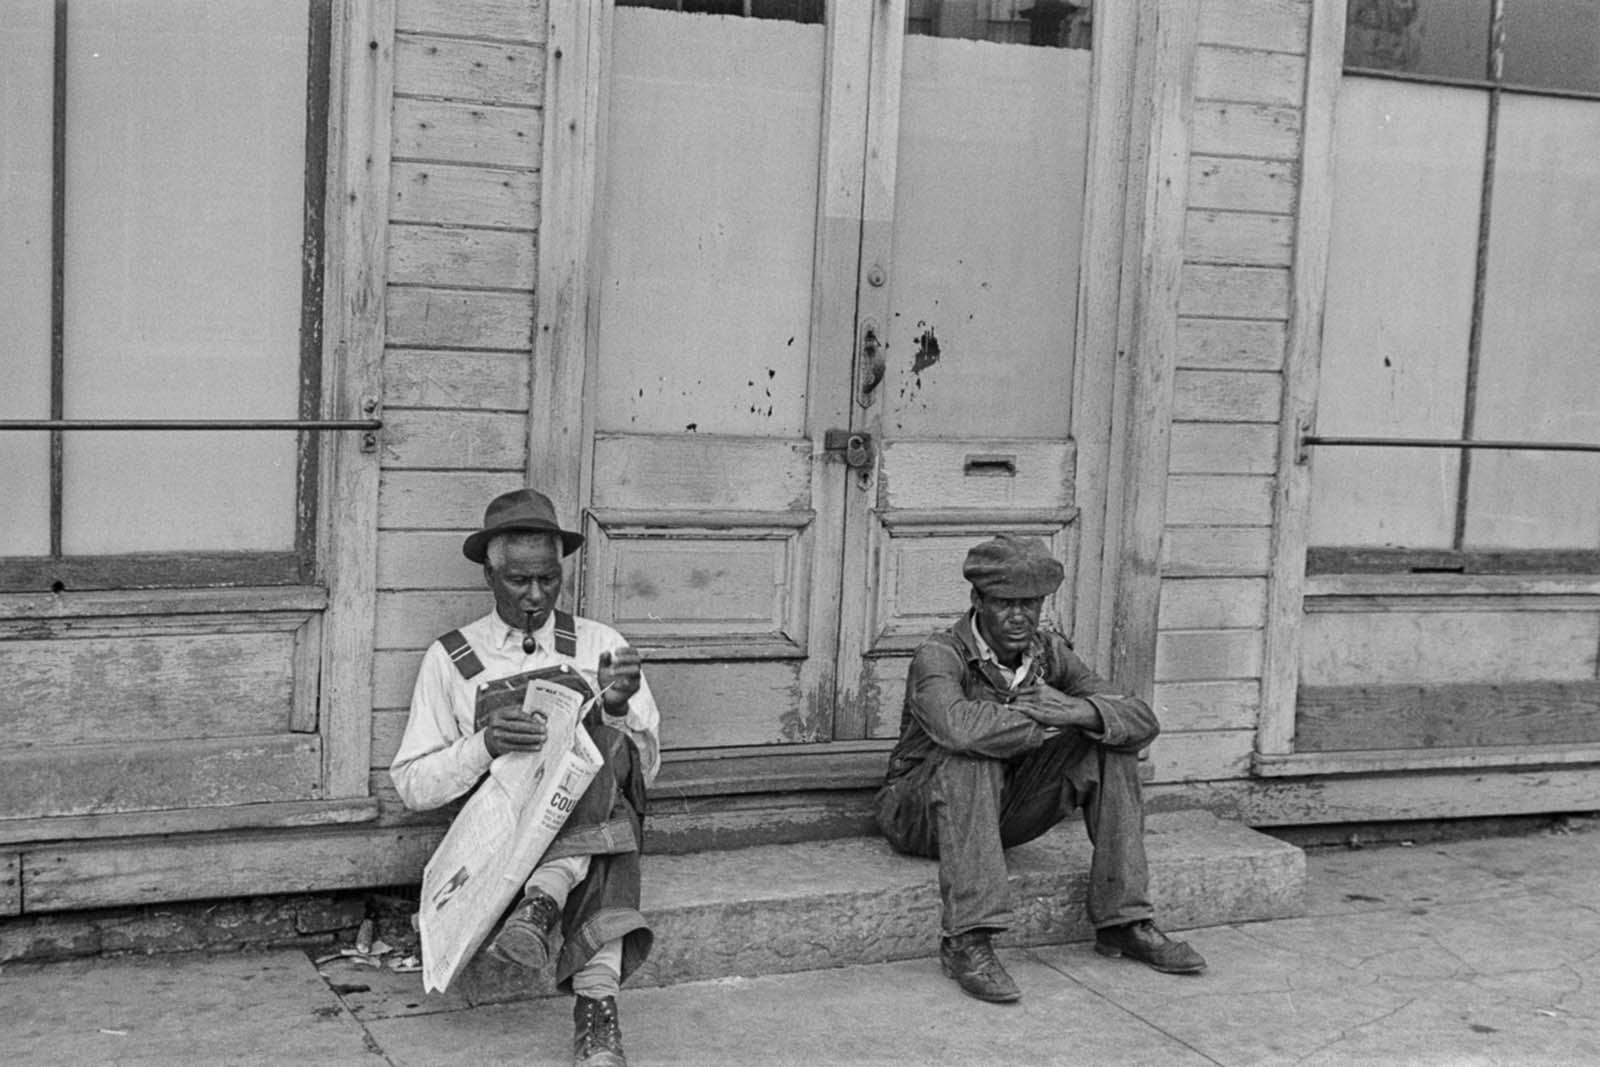 ohio london historical photos